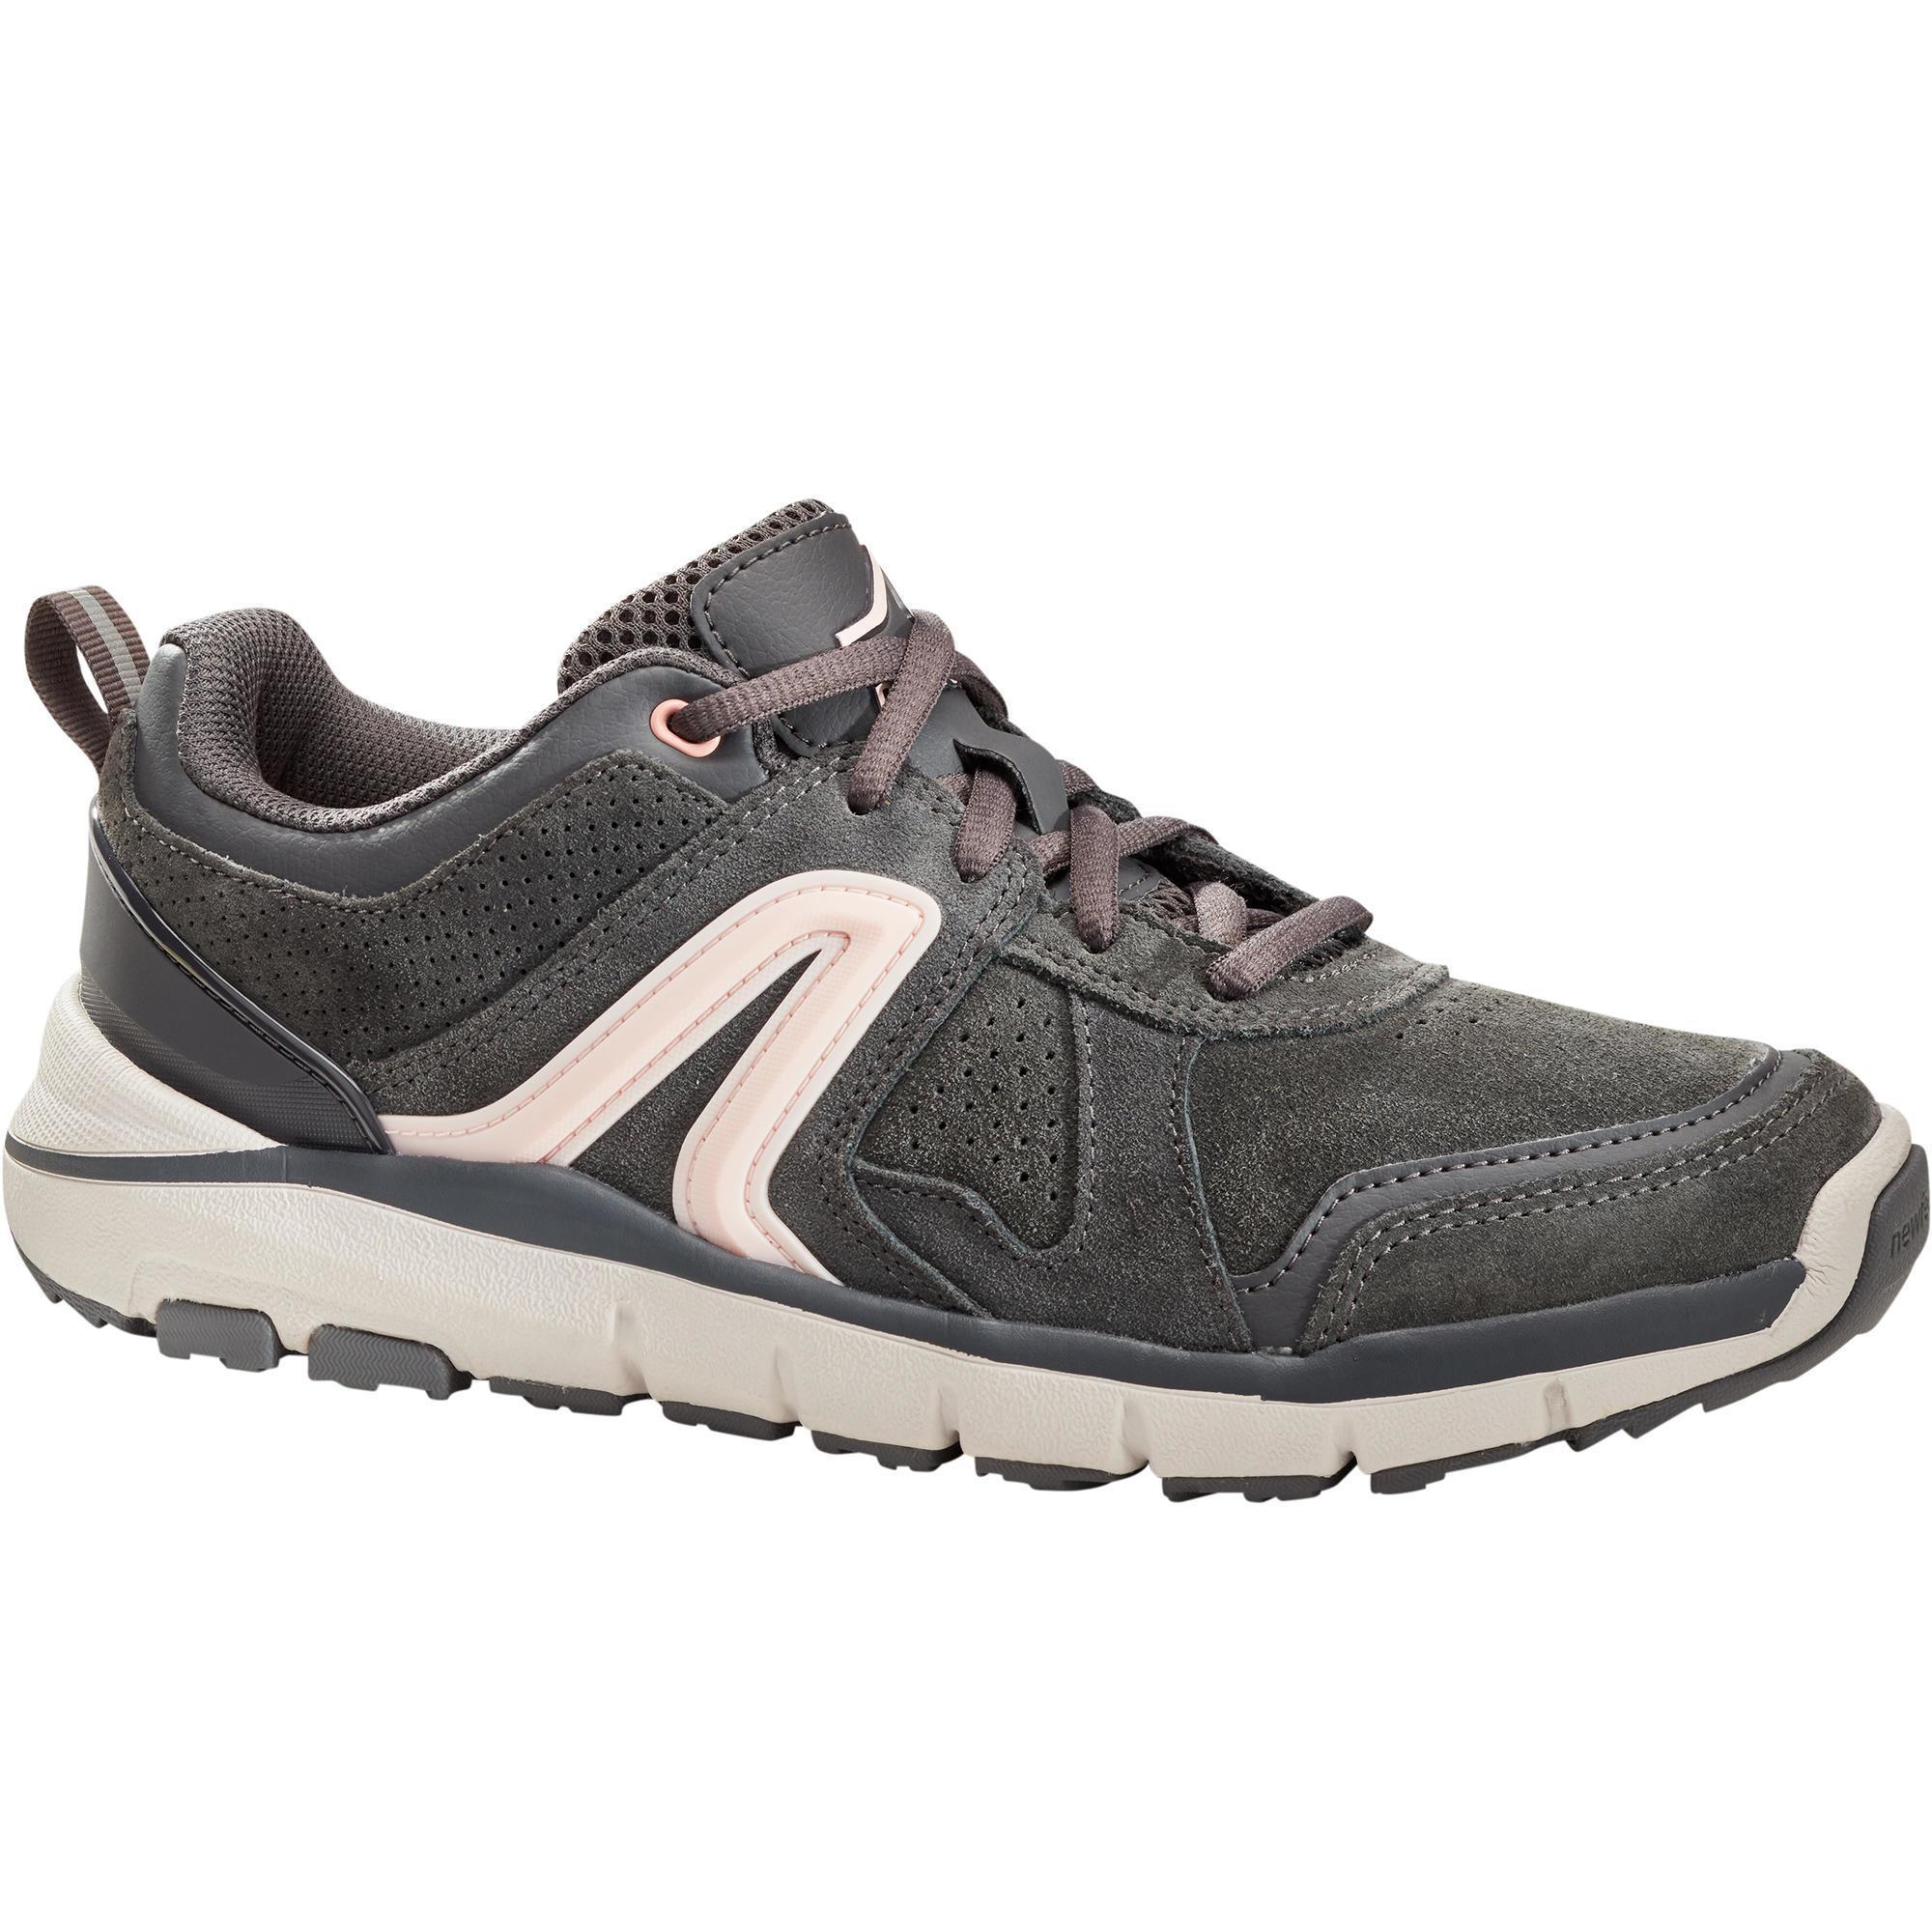 Walkingschuhe HW 540 Leder Damen dunkelgrau | Schuhe > Sportschuhe > Walkingschuhe | Newfeel